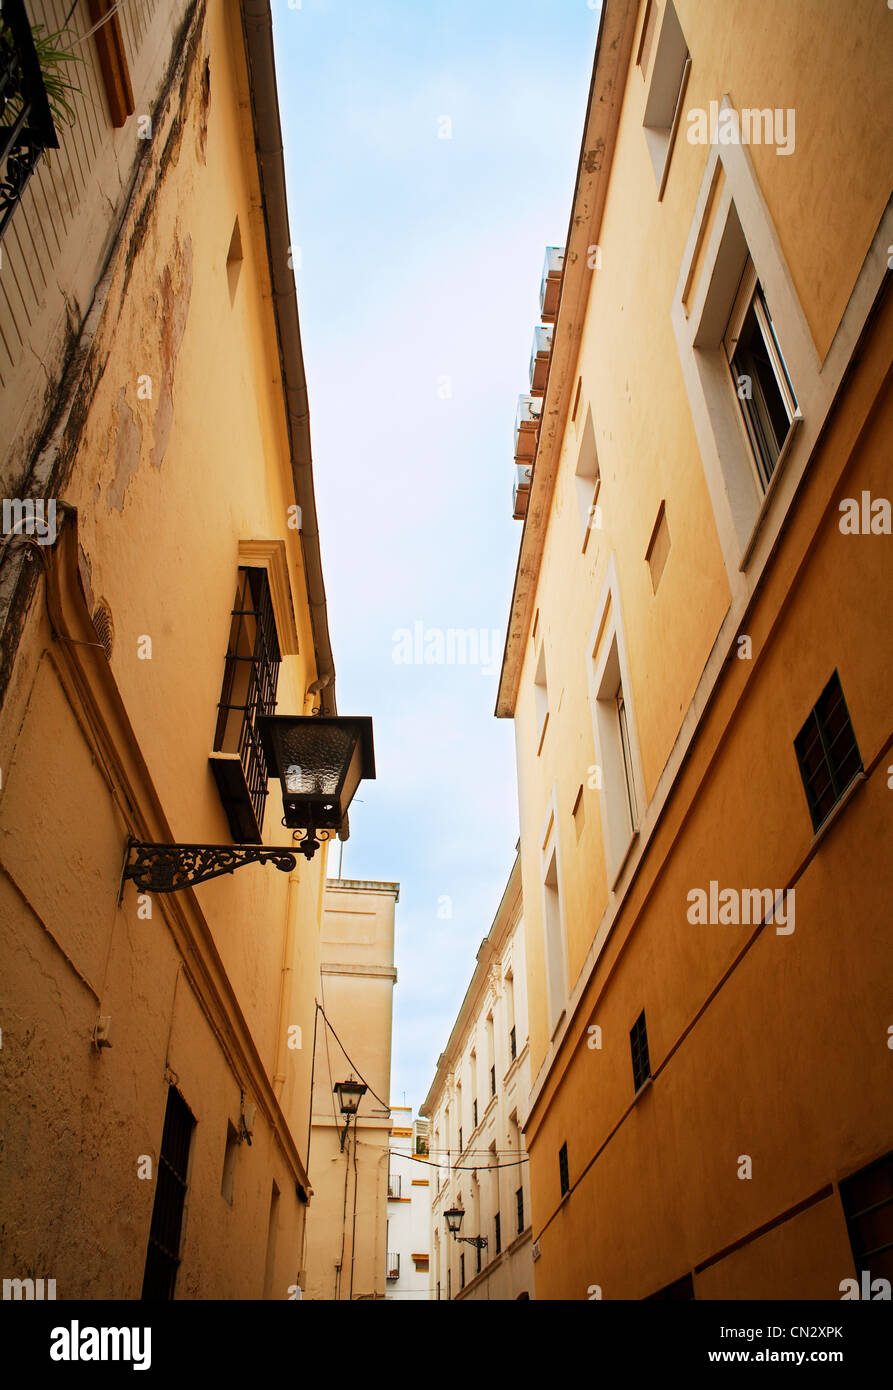 Building exterior, Seville, Spain - Stock Image